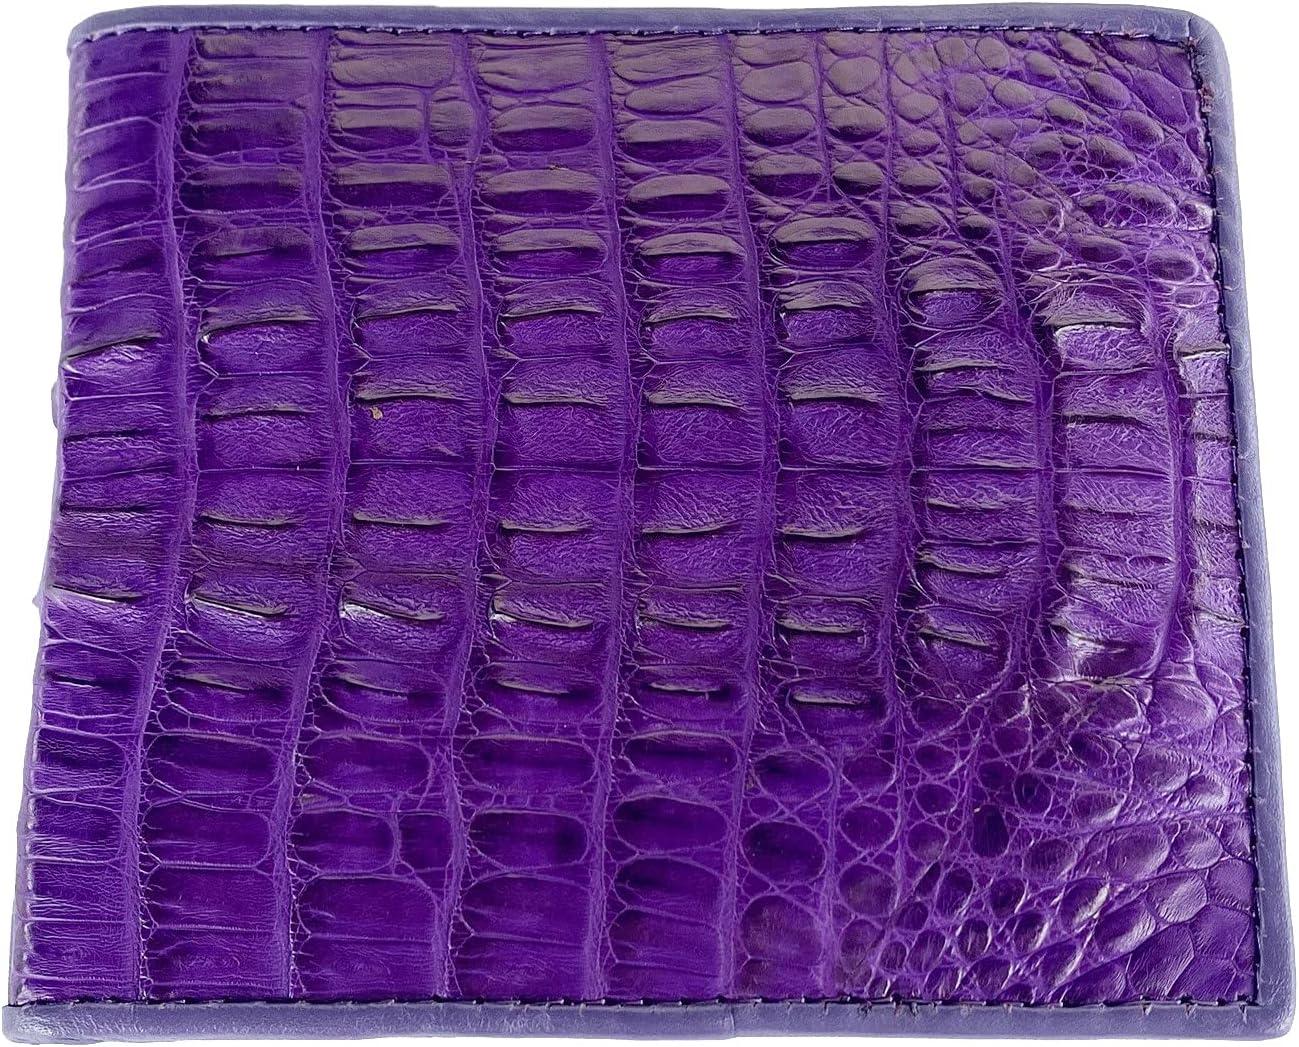 Genuine Real Tail Crocodile Alligator Skin Leather Man Bifold Purple Wallet